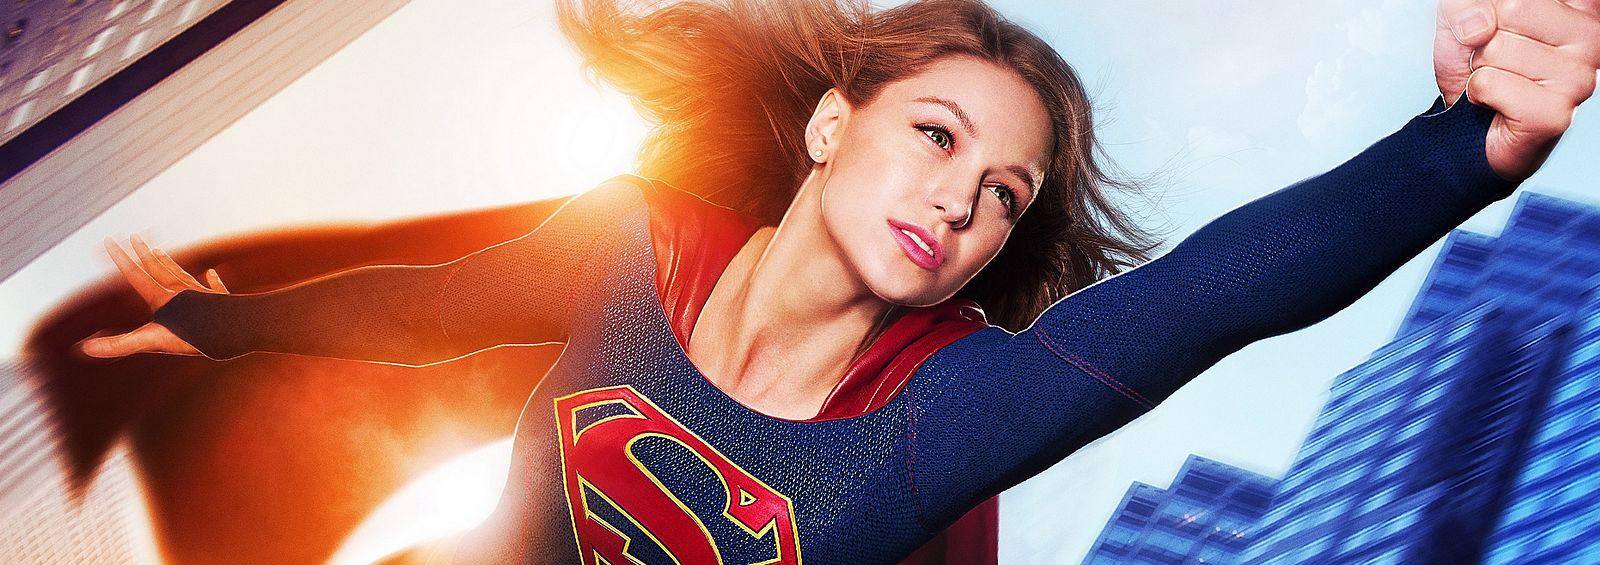 supergirl staffel 2 folge 1